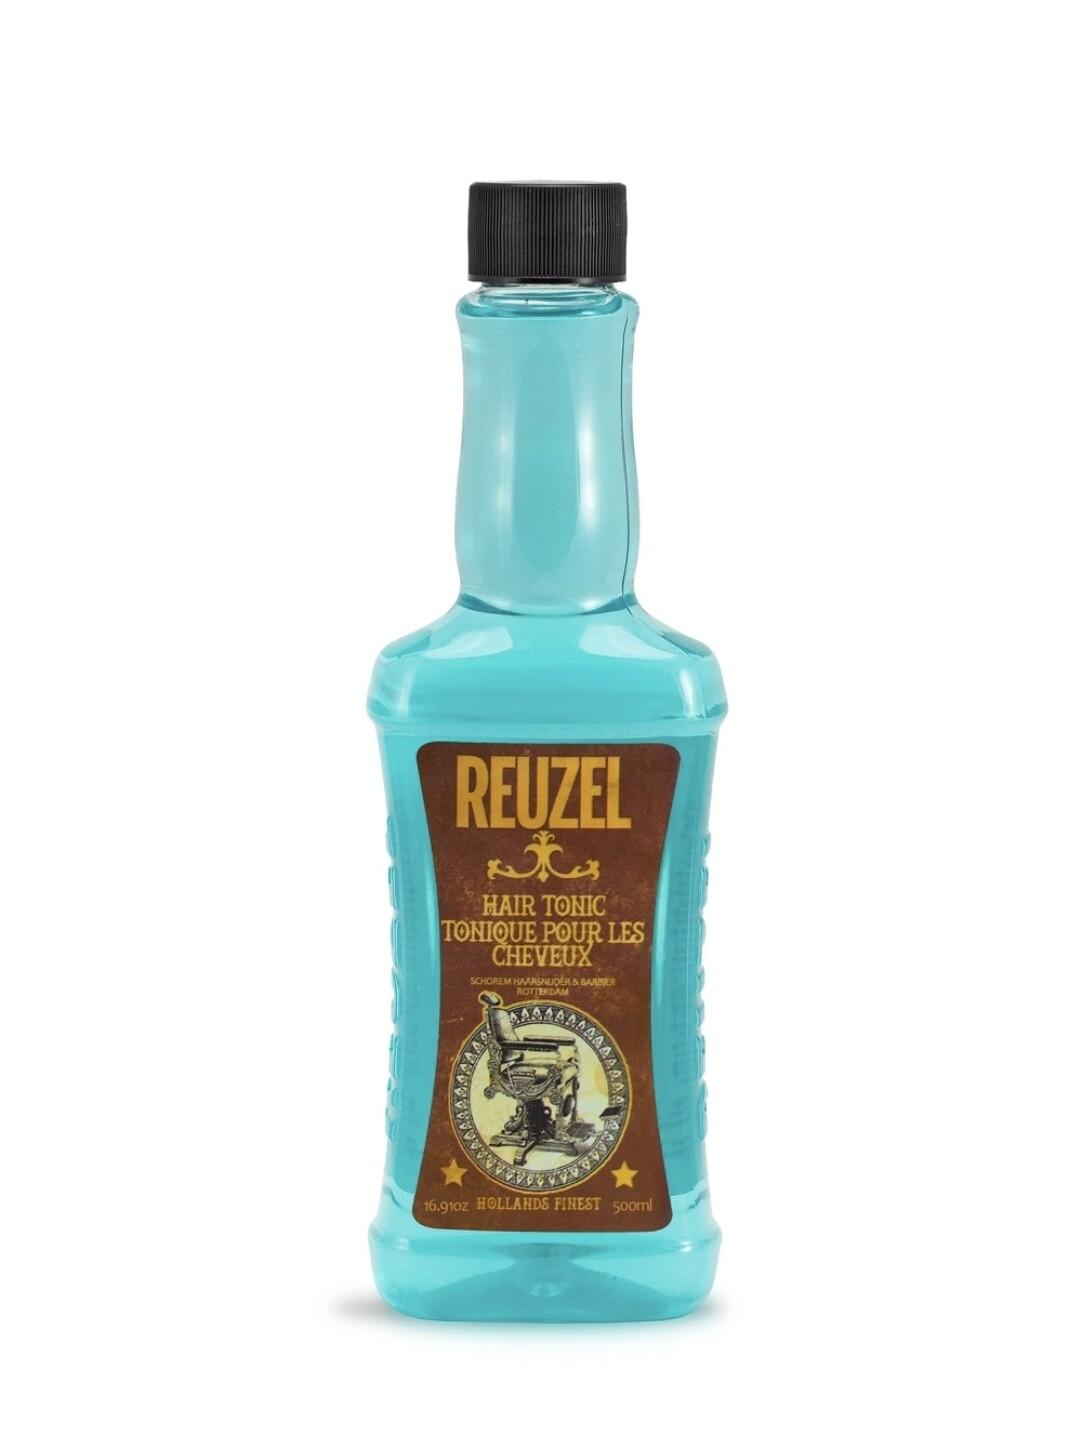 Reuzel Hair Tonic - Тоник для волос 500 мл